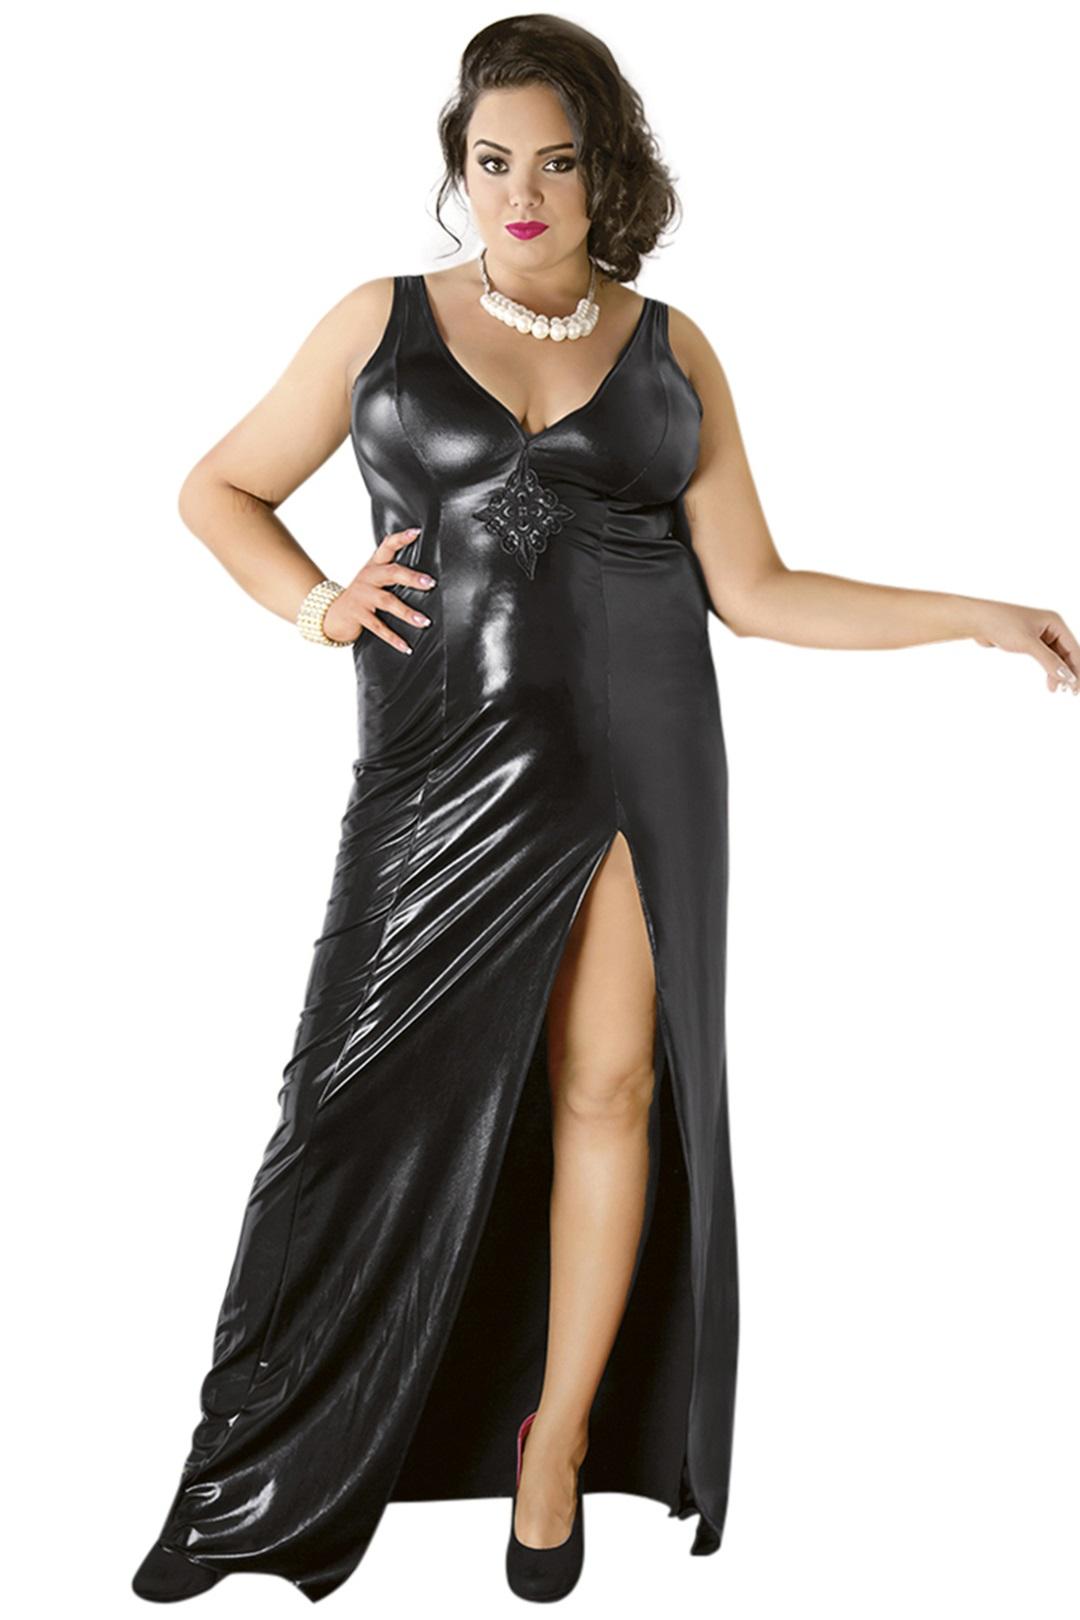 C/4005 Langes schwarzes Wetlook-Kleid von Andalea Dessous